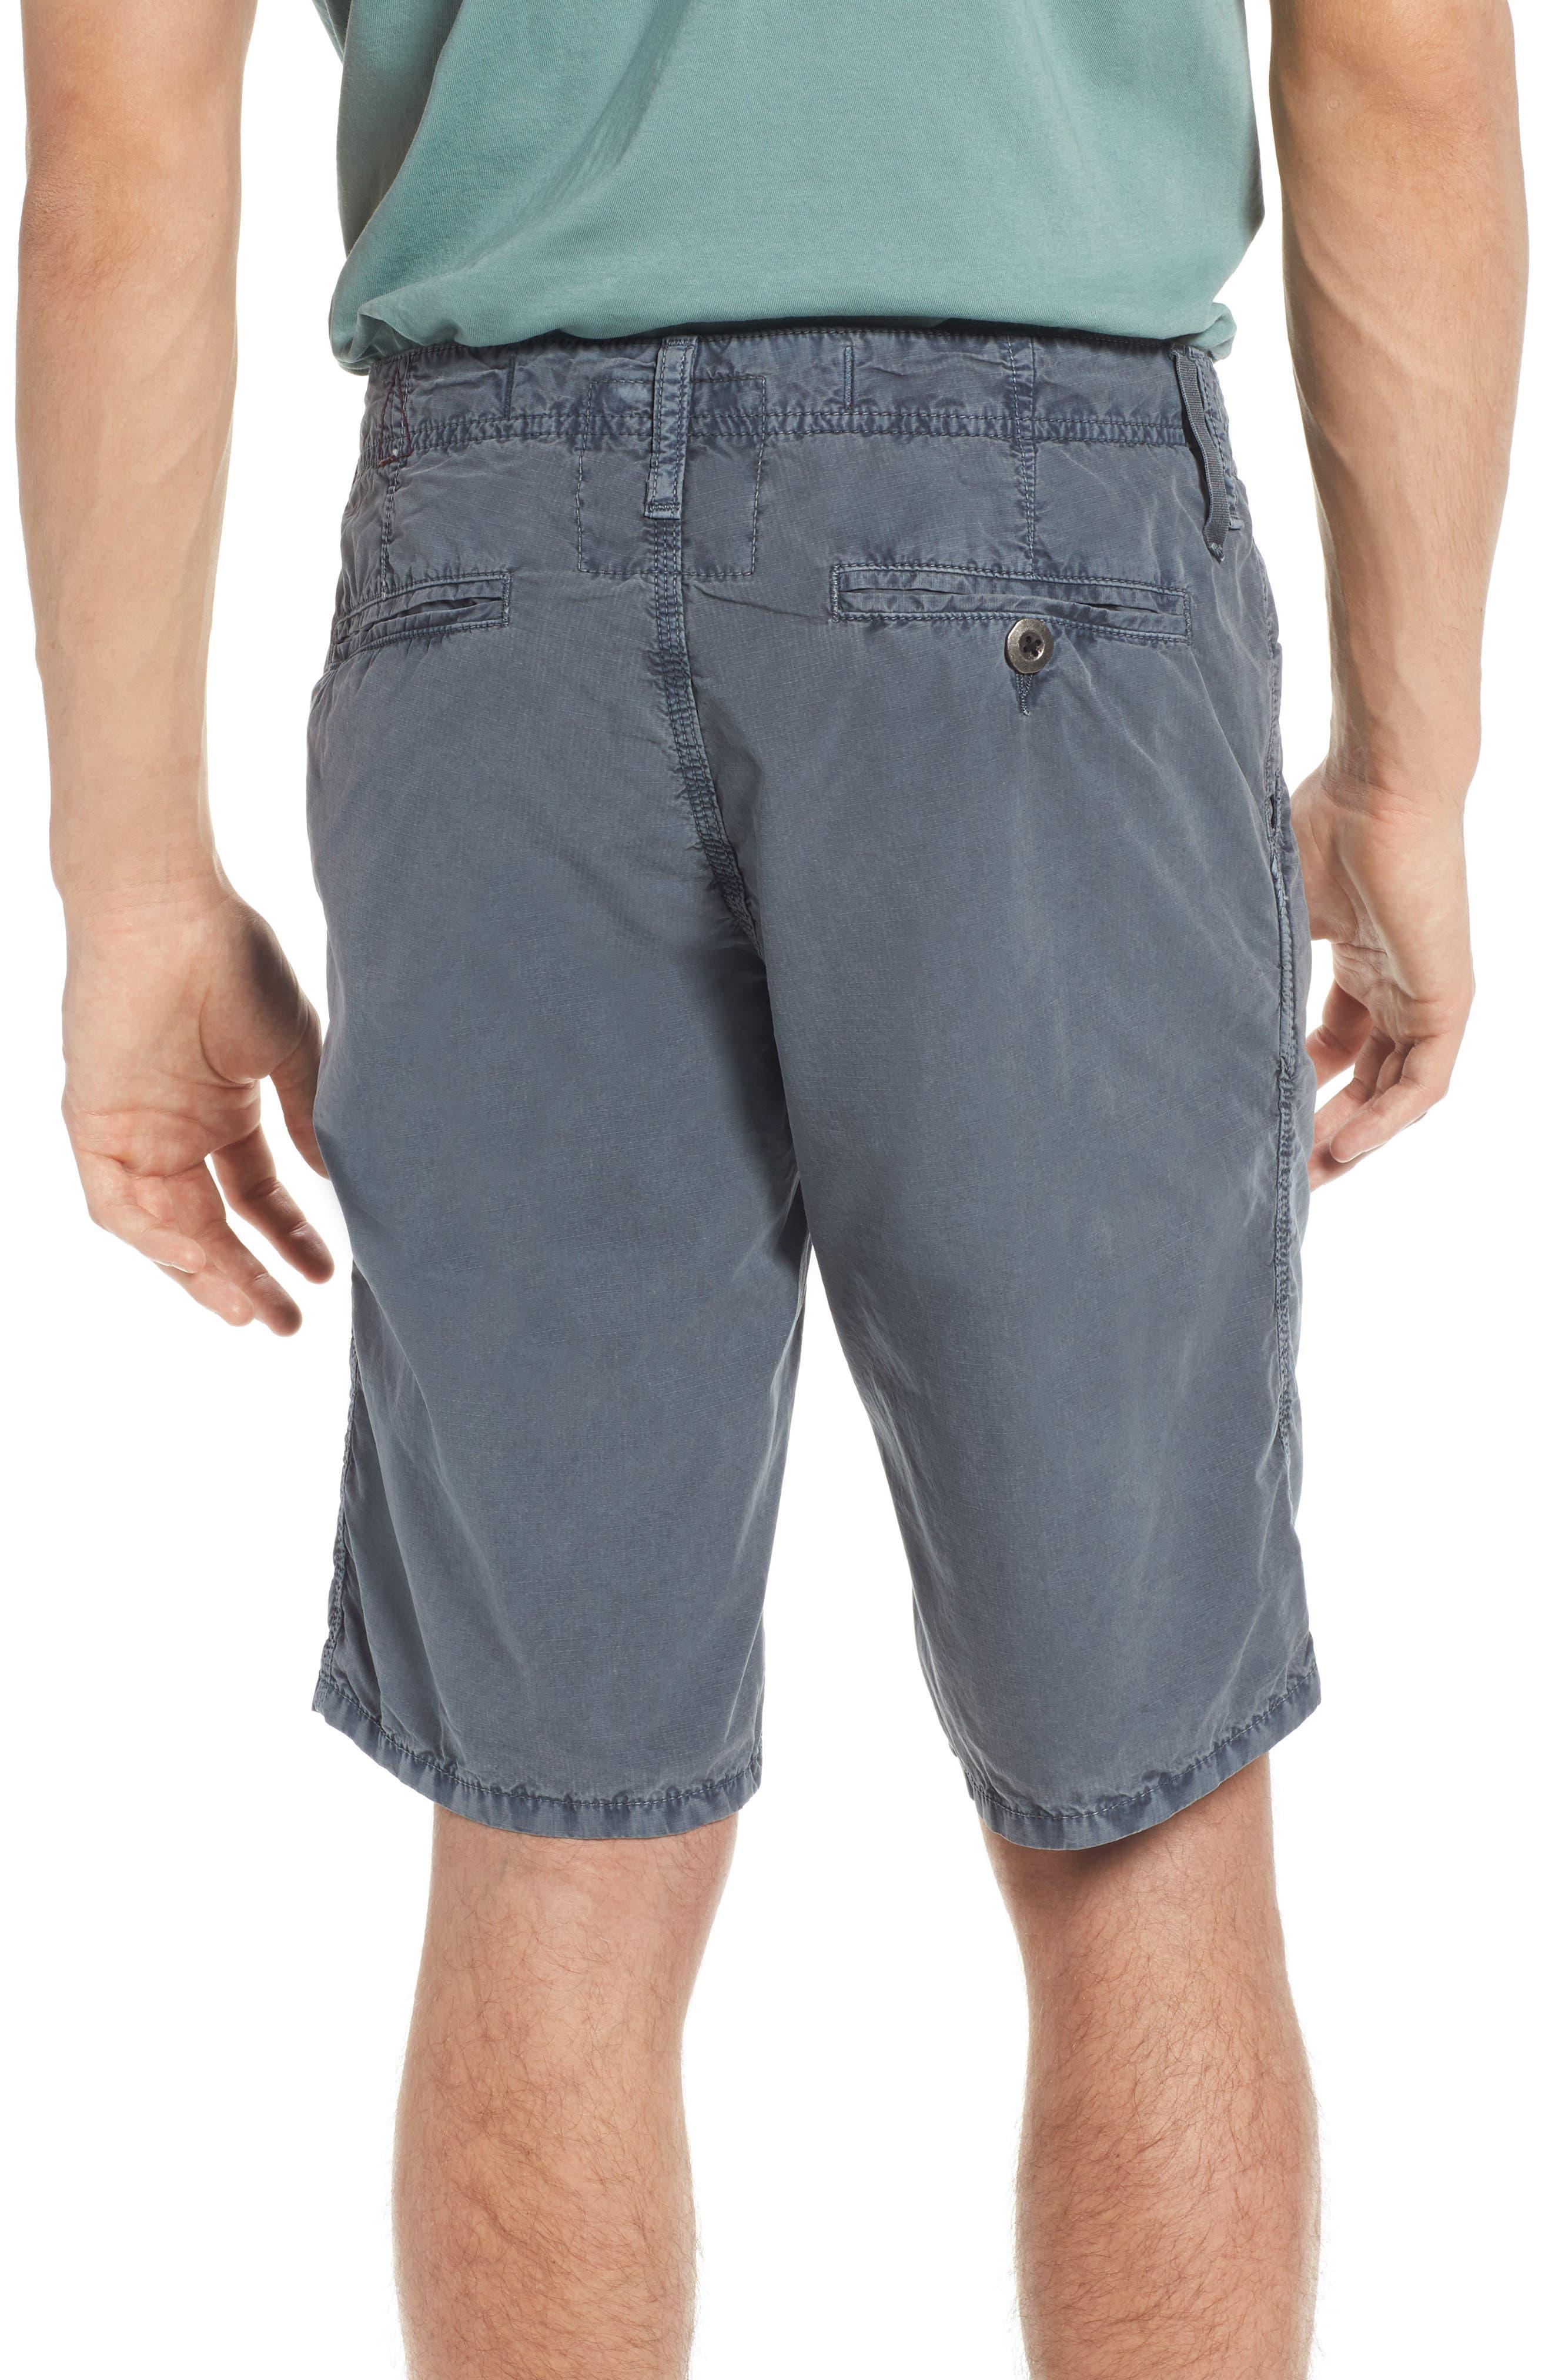 Palm Springs Shorts,                             Alternate thumbnail 7, color,